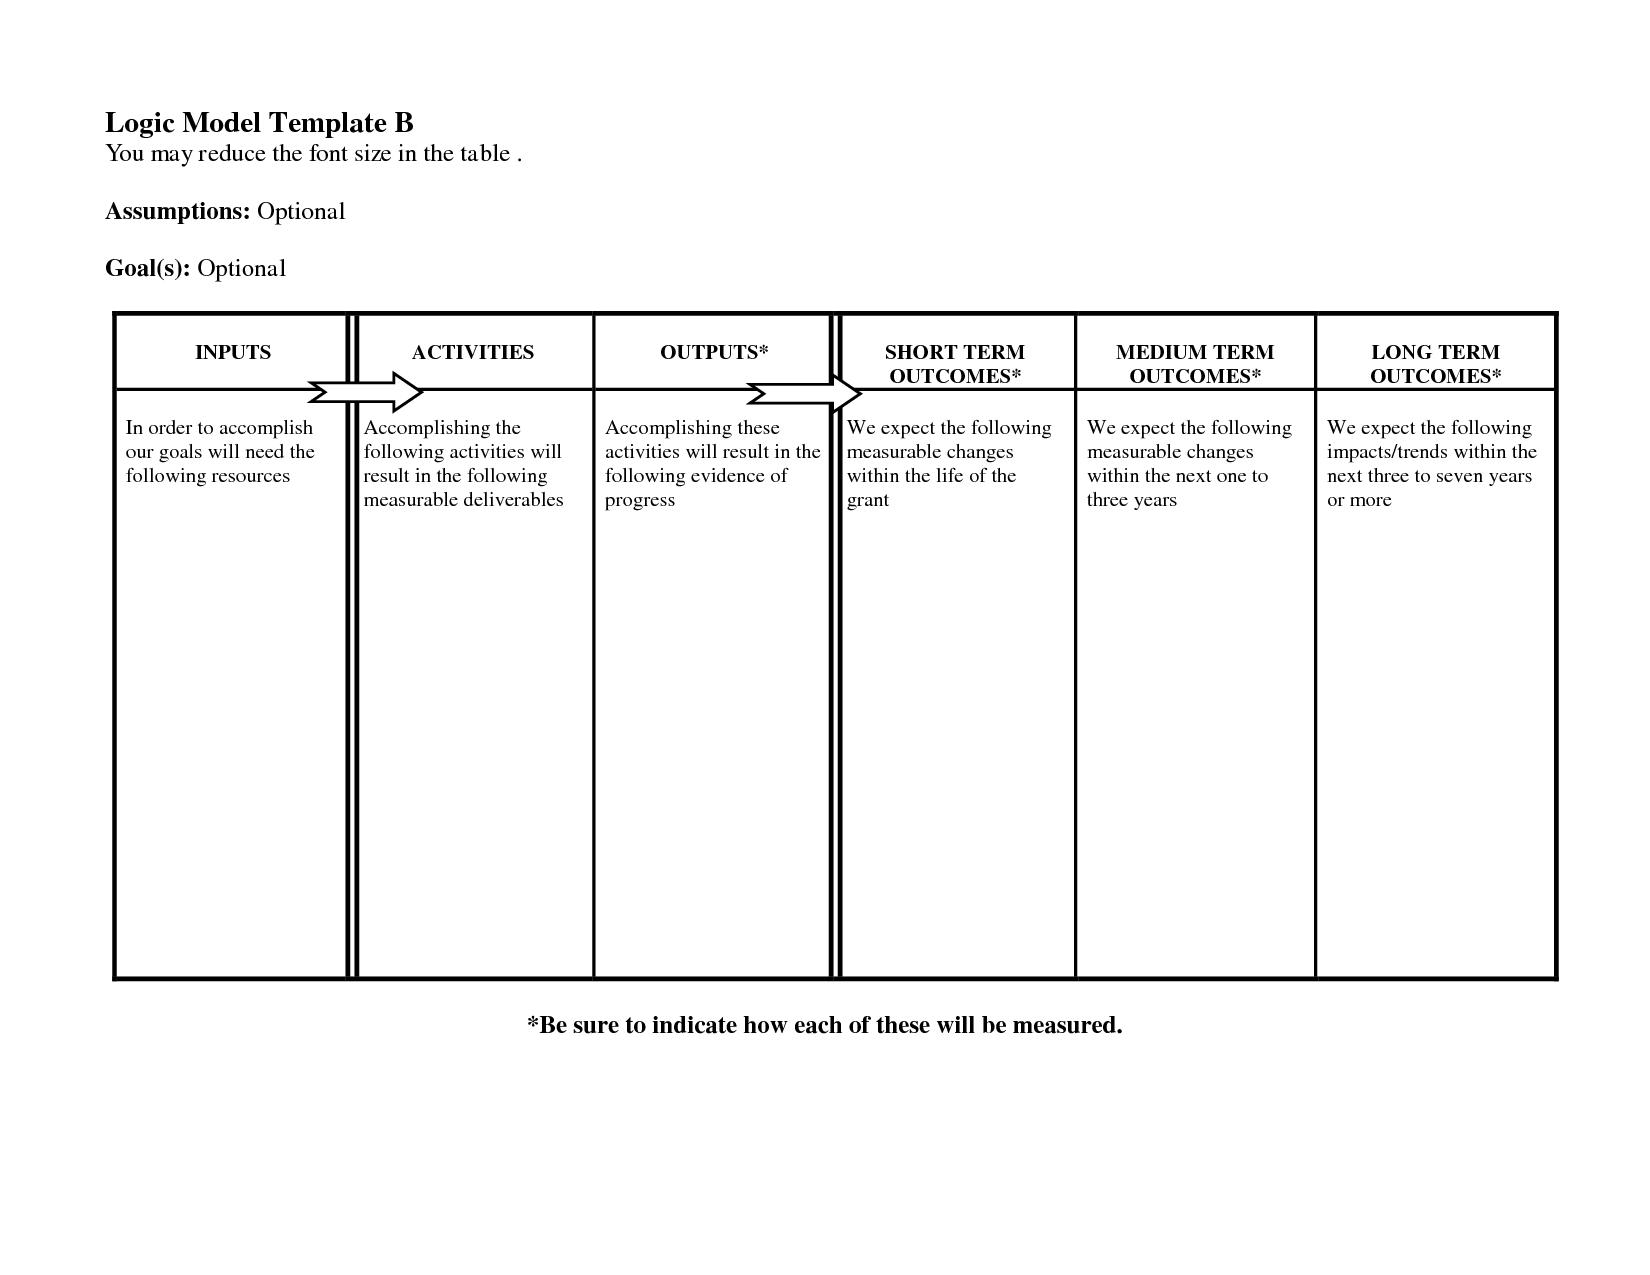 Logic Model Template | E Commercewordpress With Regard To Logic Model Template Word